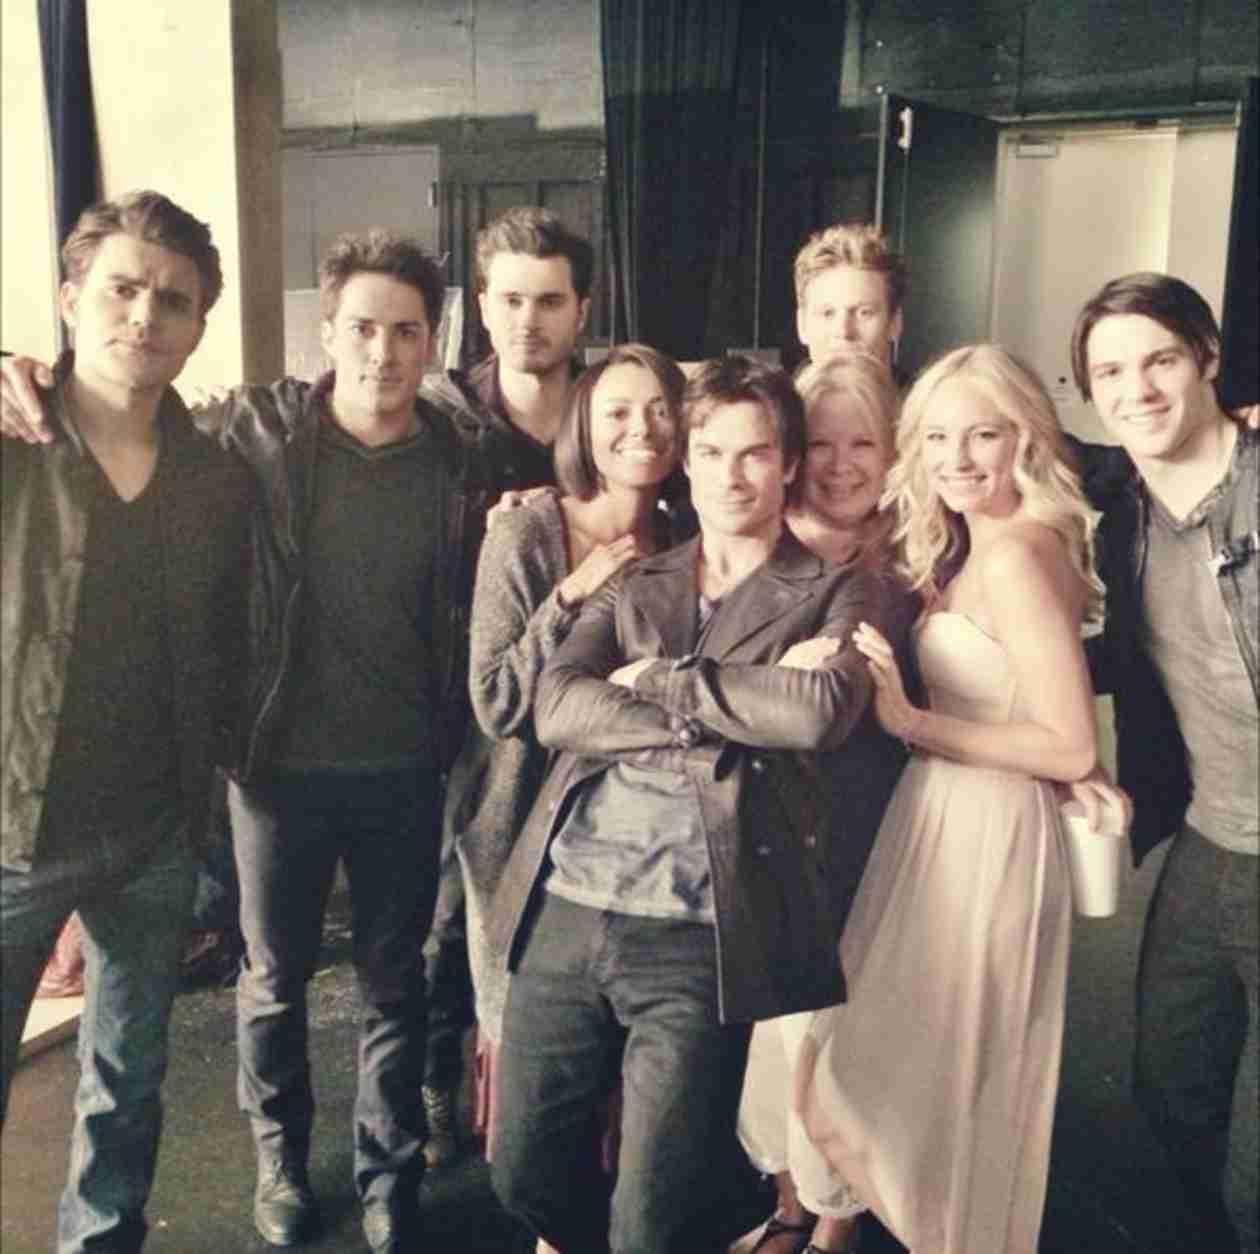 The Vampire Diaries Season 6: Who Will Die?